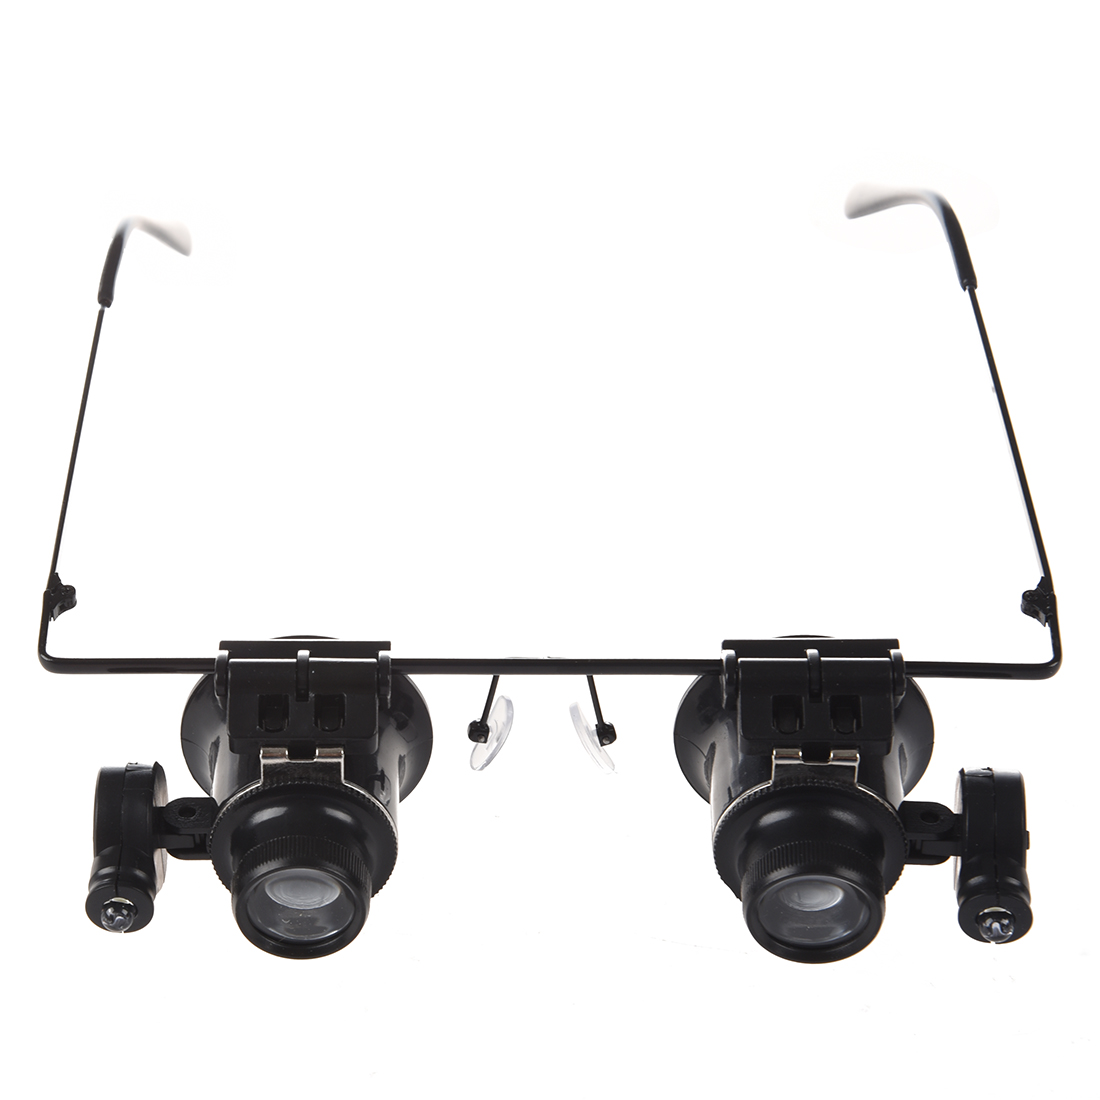 DSHA New Hot 20x Magnifier Magnifying Eye Glasses Loupe Lens Jeweler Watch Repair LED Light